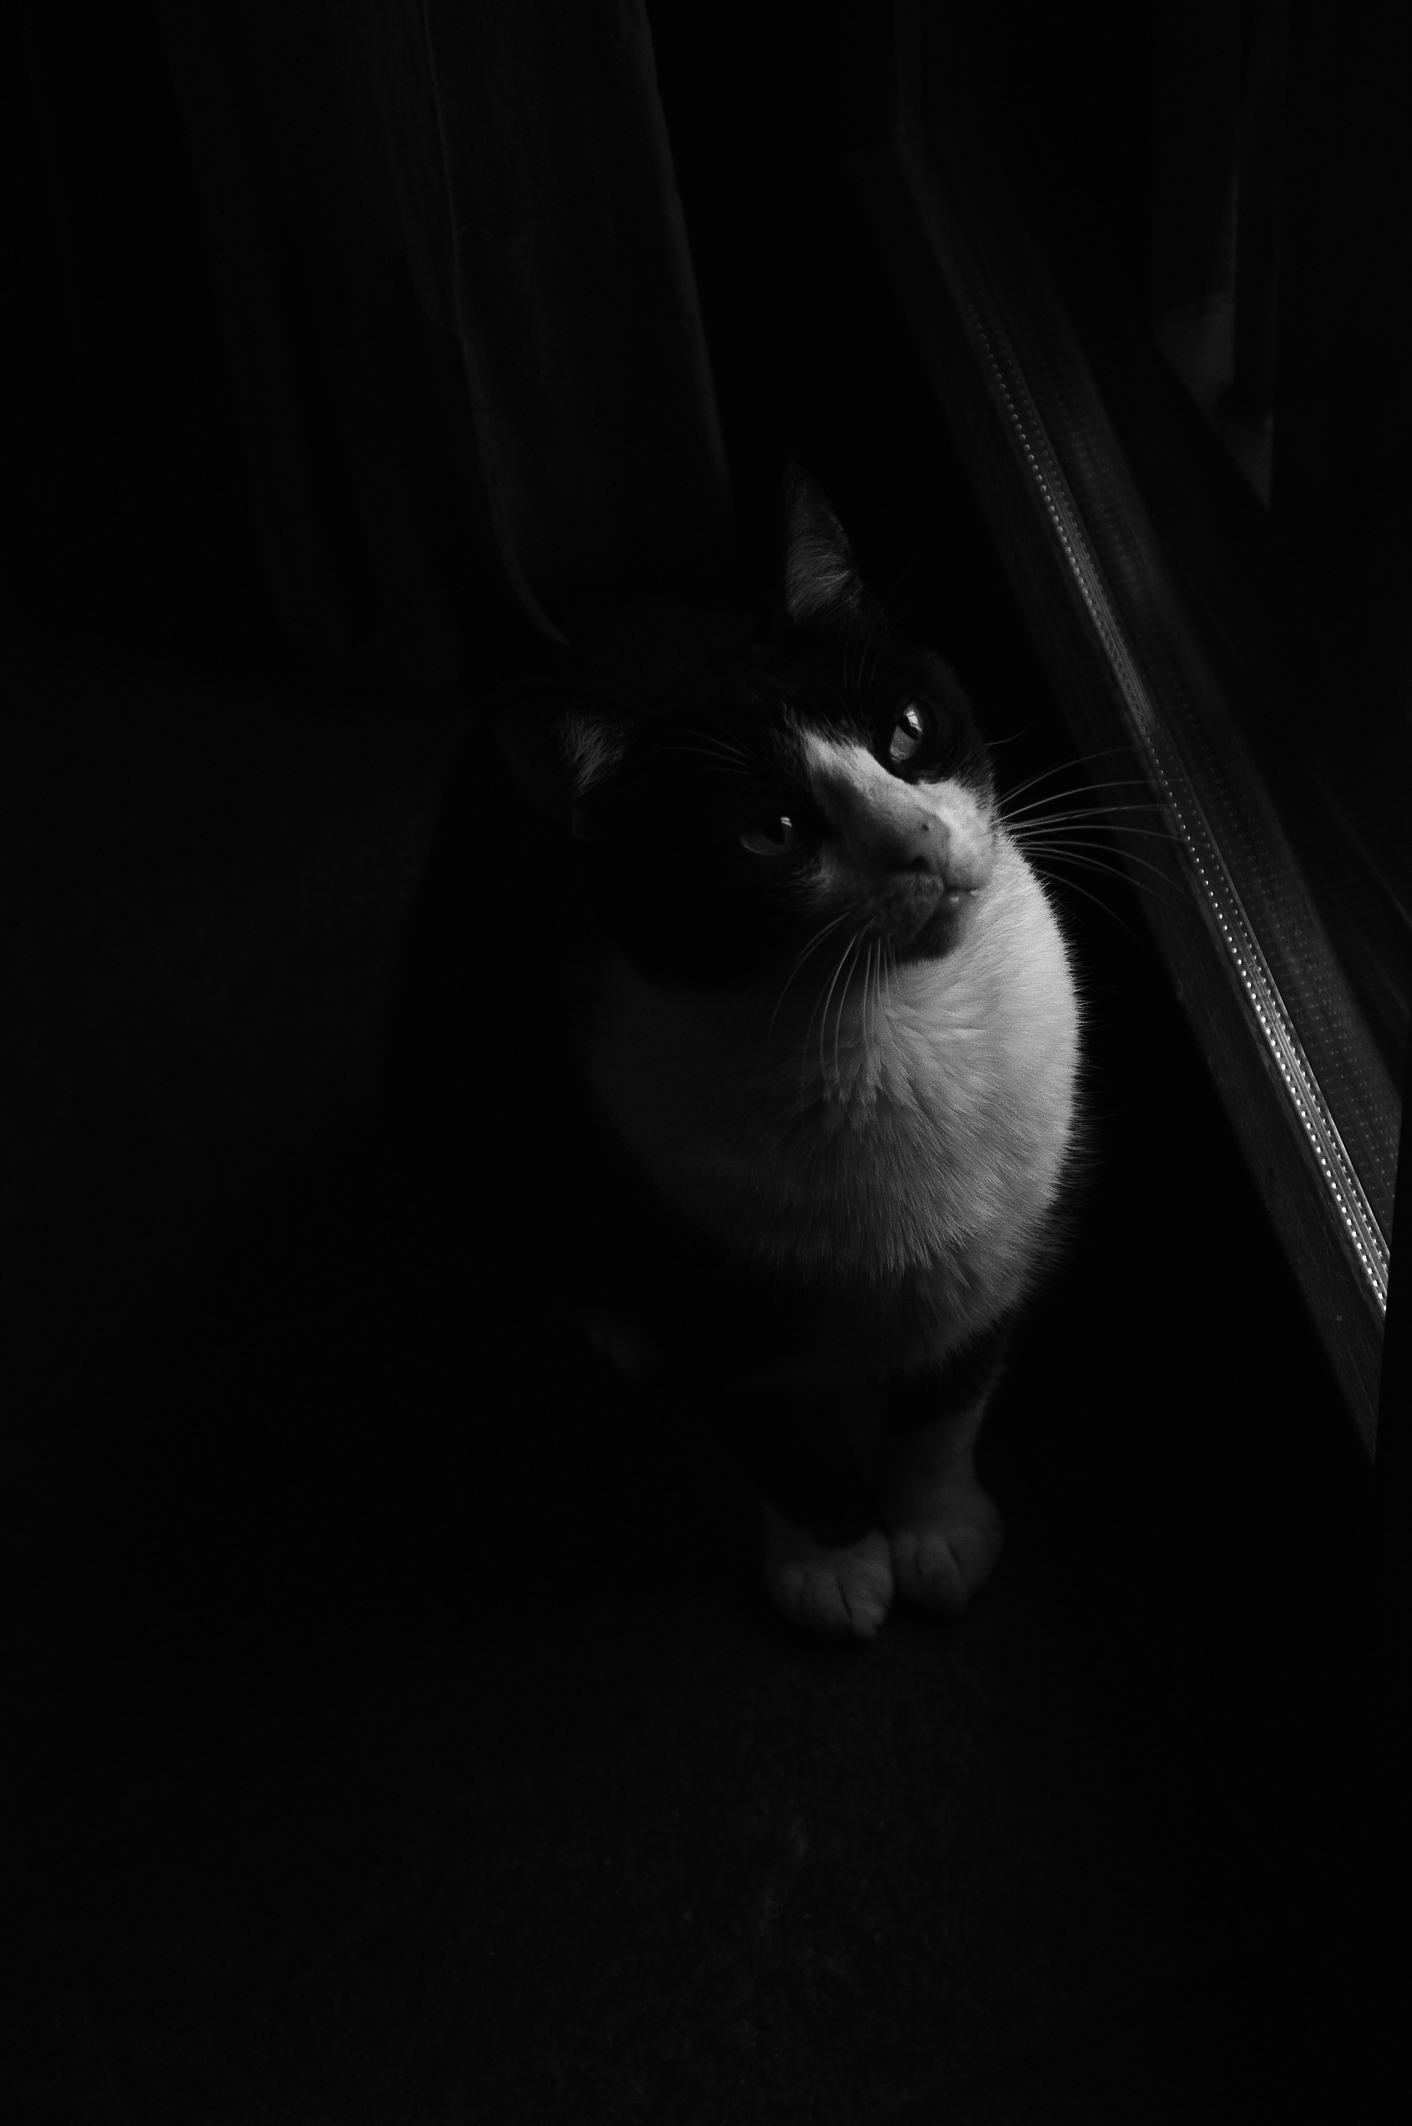 dark-cat-on-black